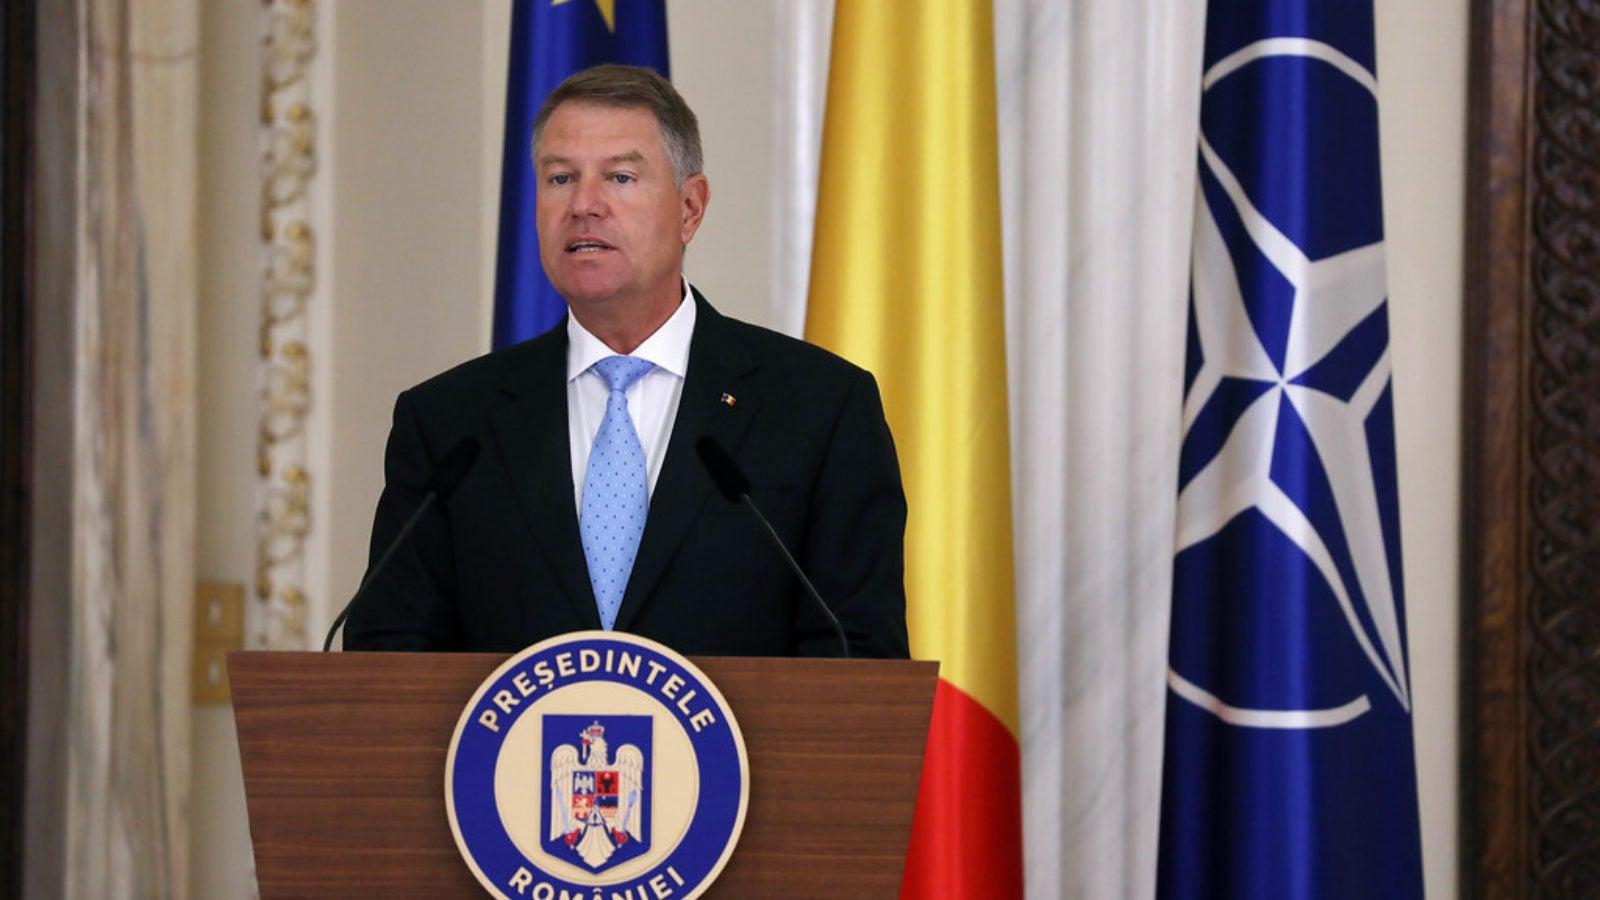 President of Romania